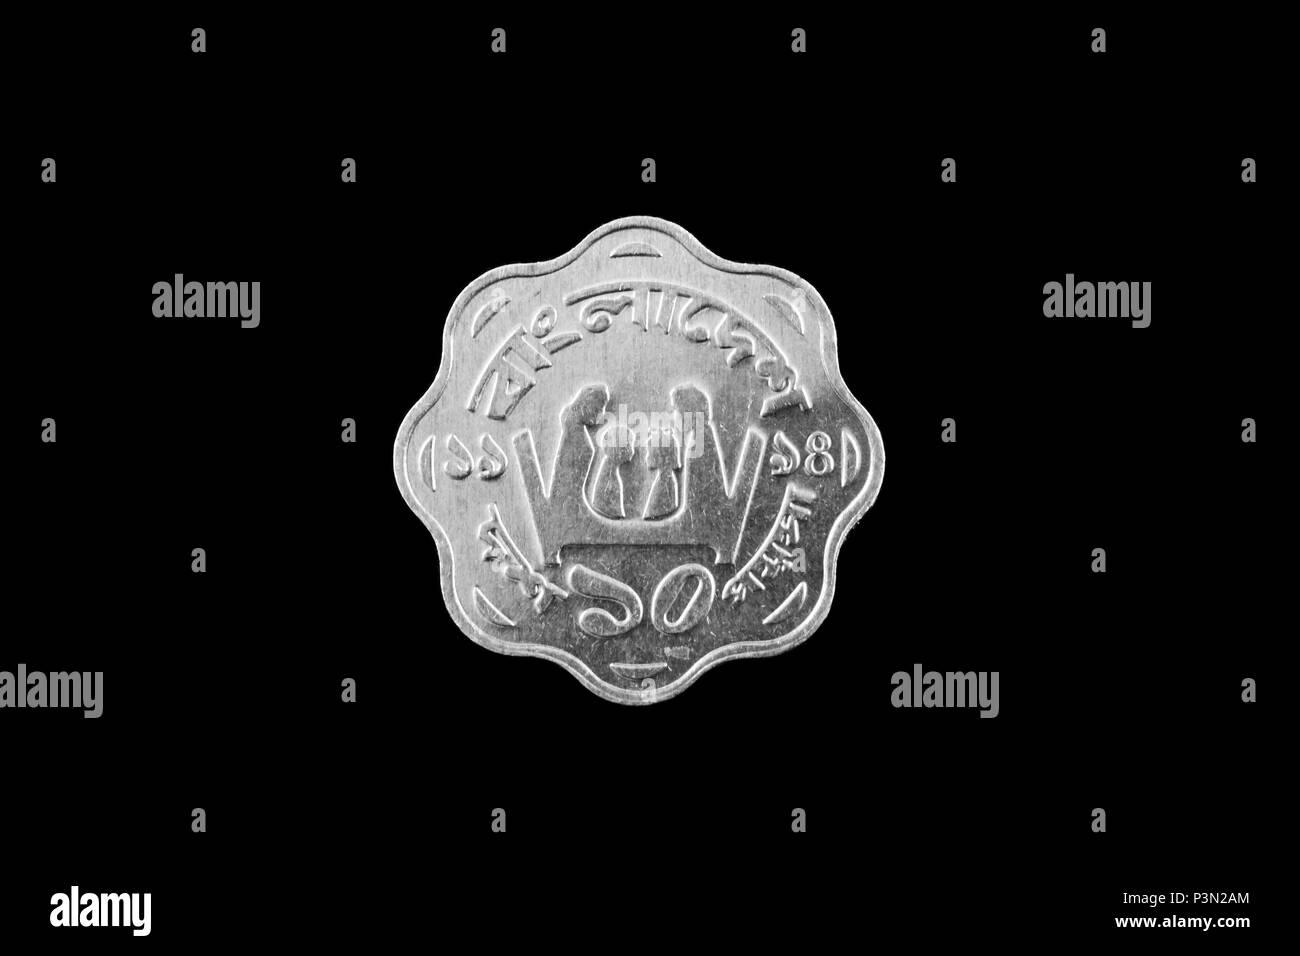 Bangladeshi 10 Poisha steel coin close up isolated on a black background - Stock Image